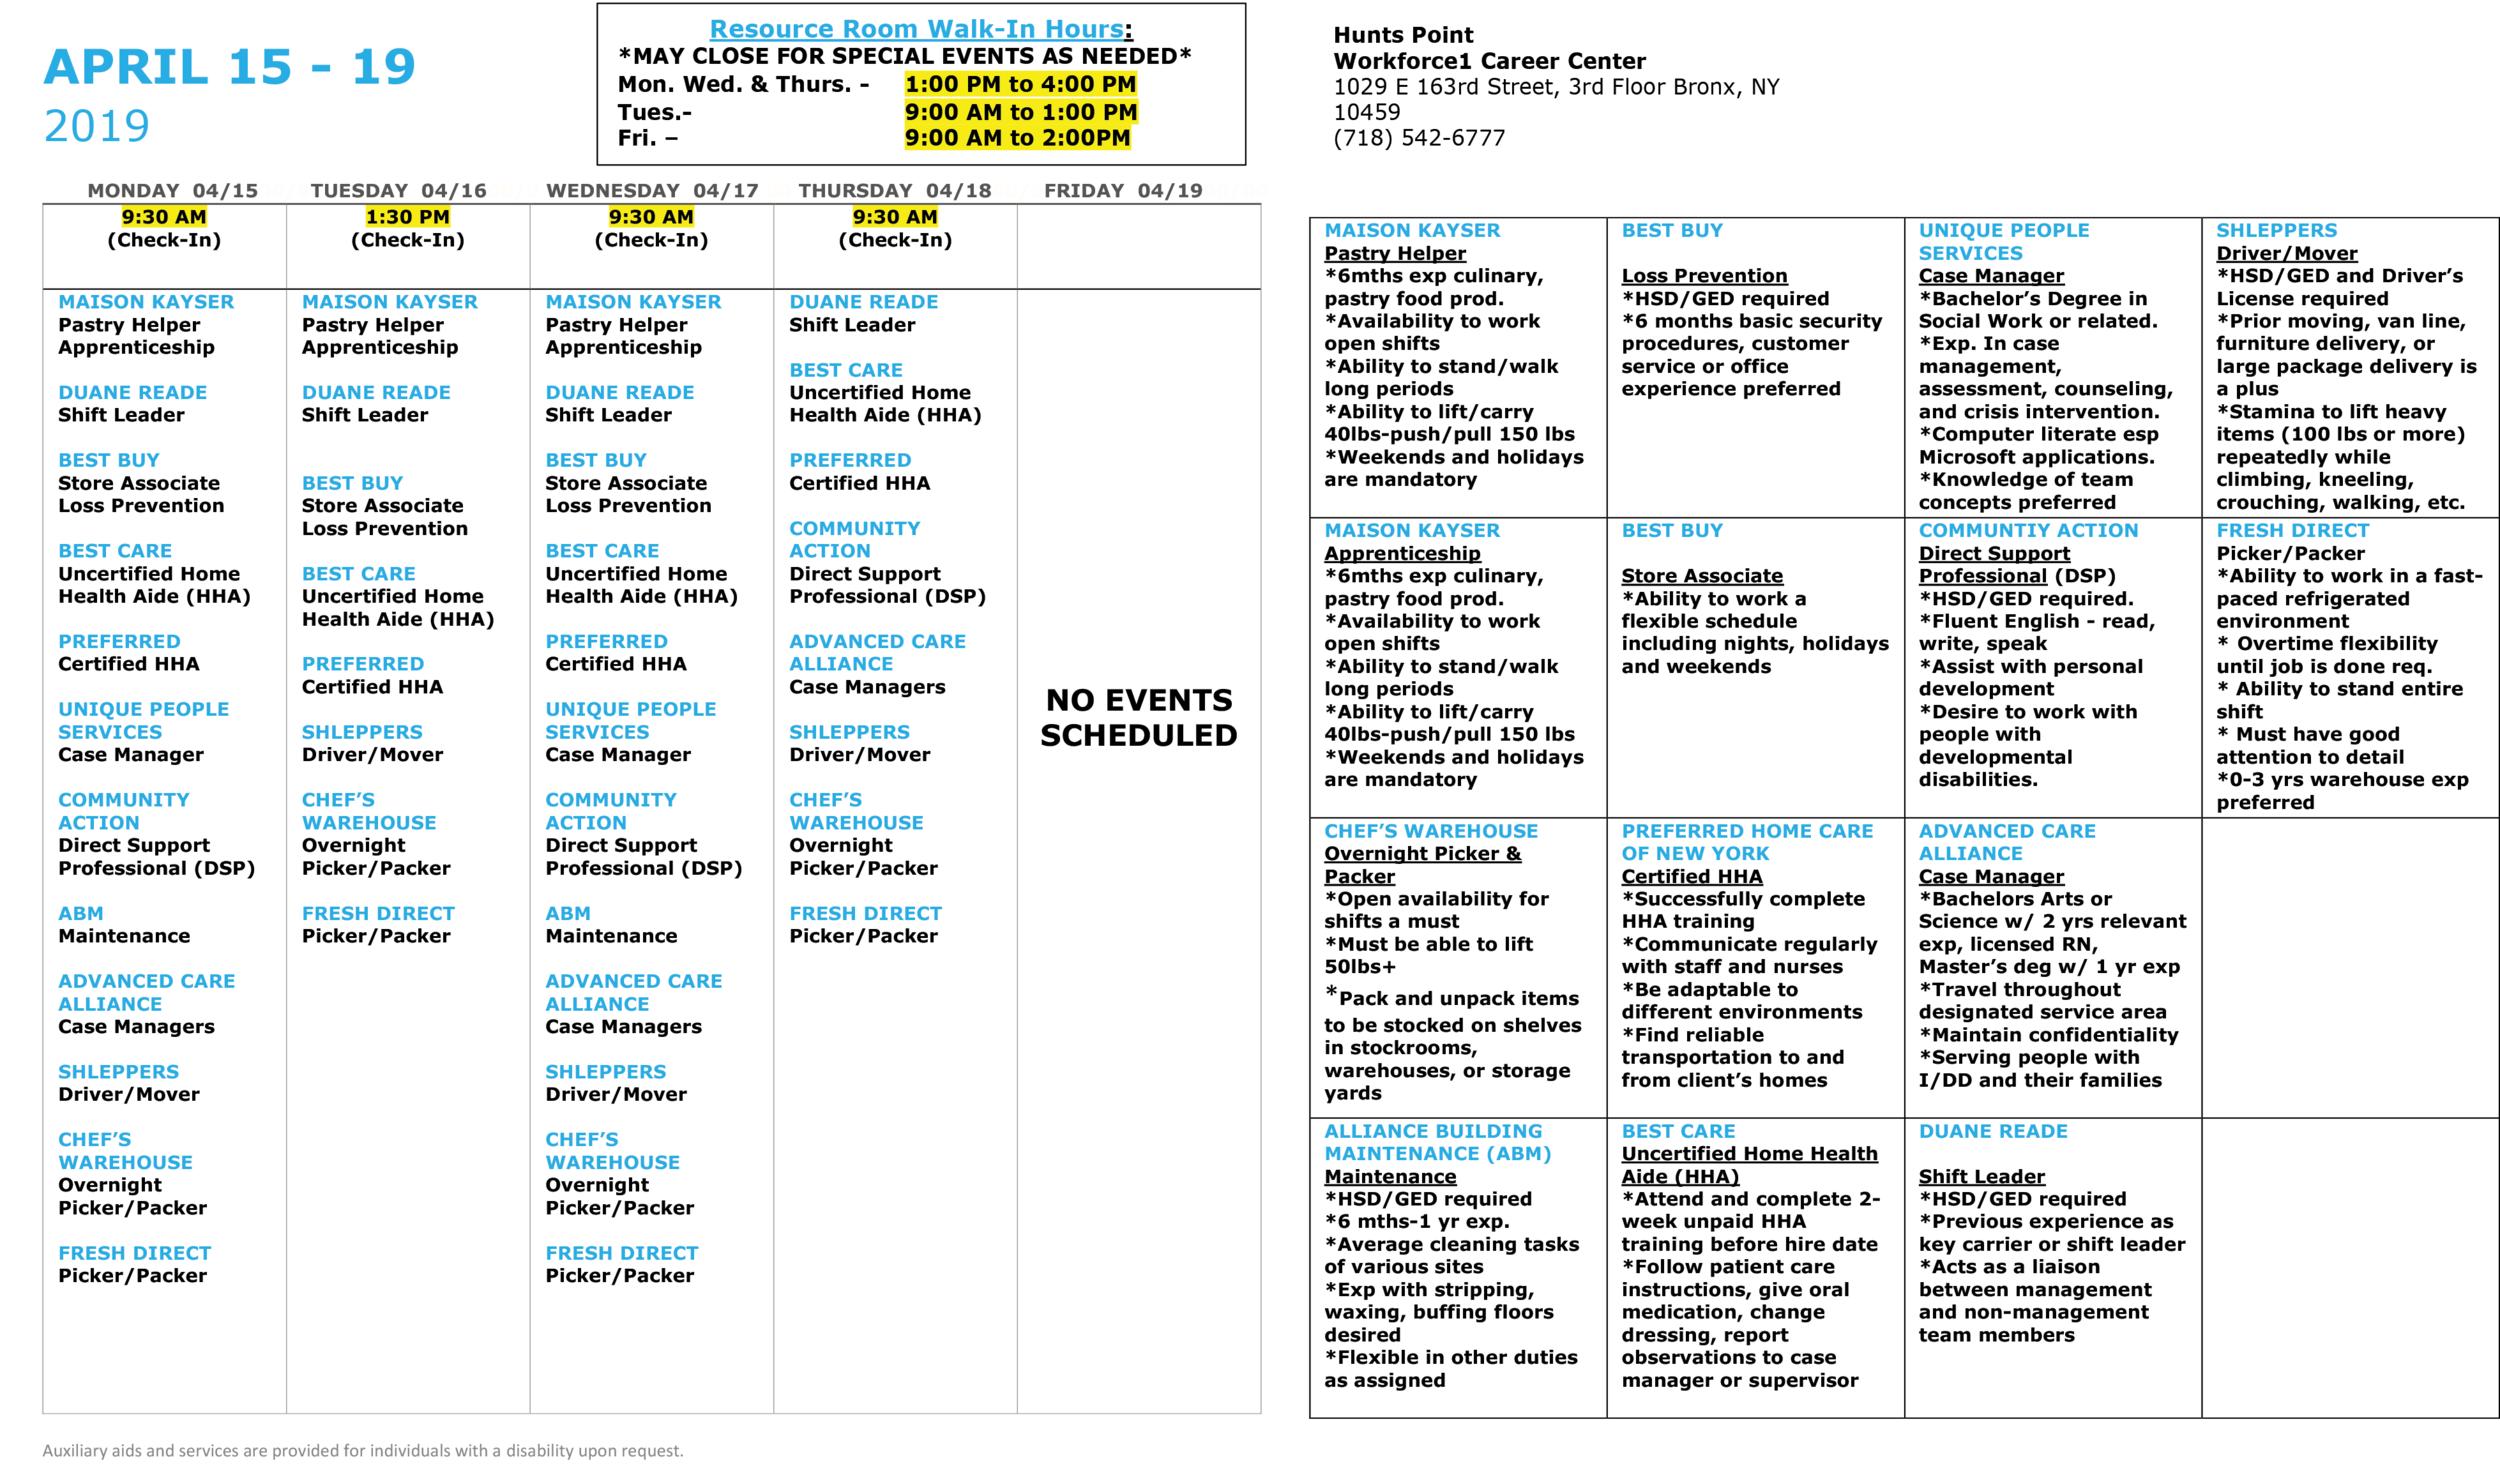 HP Recruitment Calendar 4-15-19 to 4-19-19_Page_2.jpg